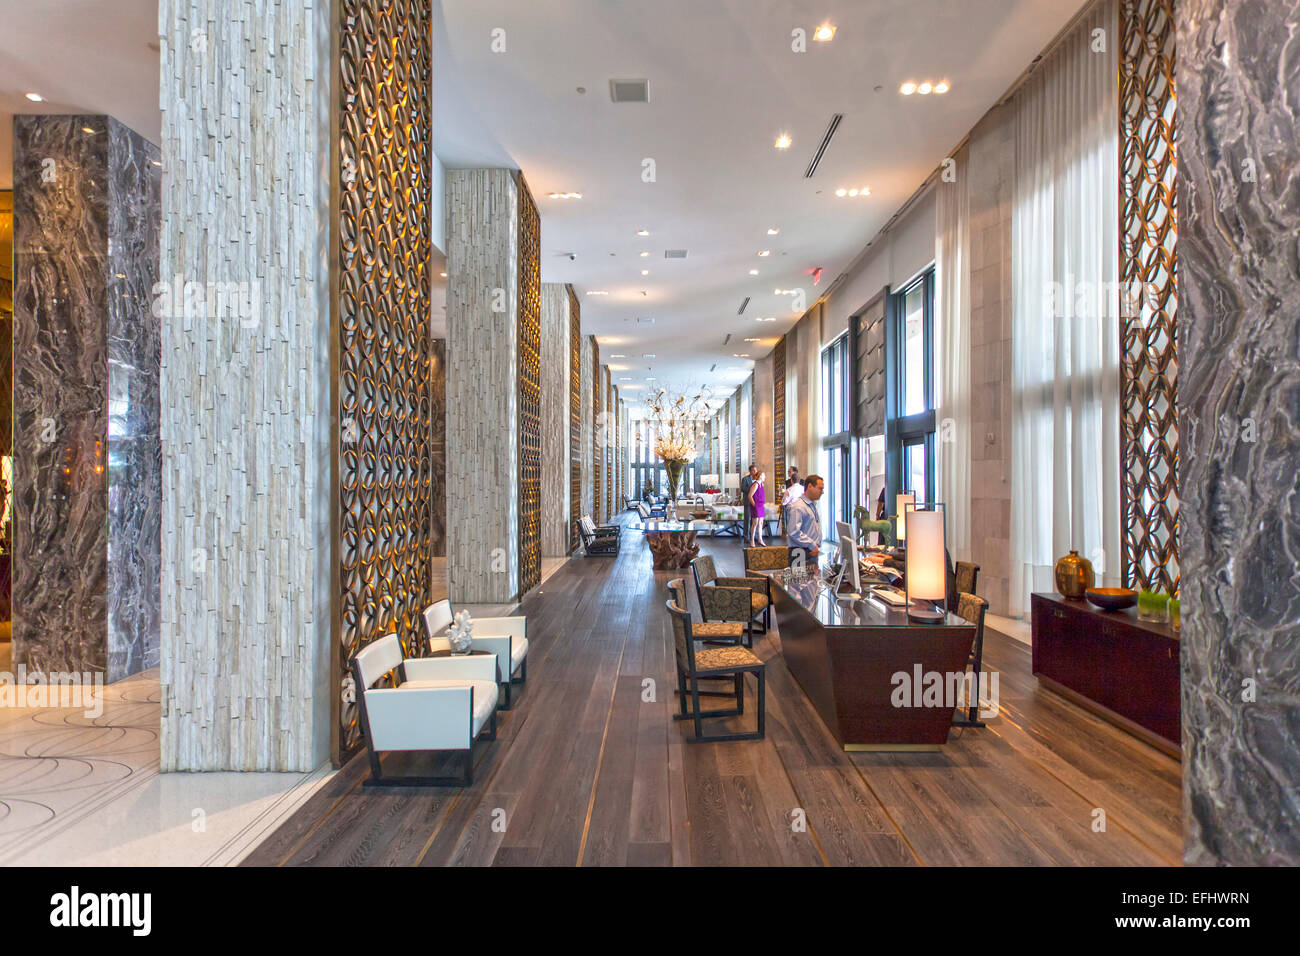 Lobby of luxury resort w hotel of starwood hotel chain for Design hotel chain